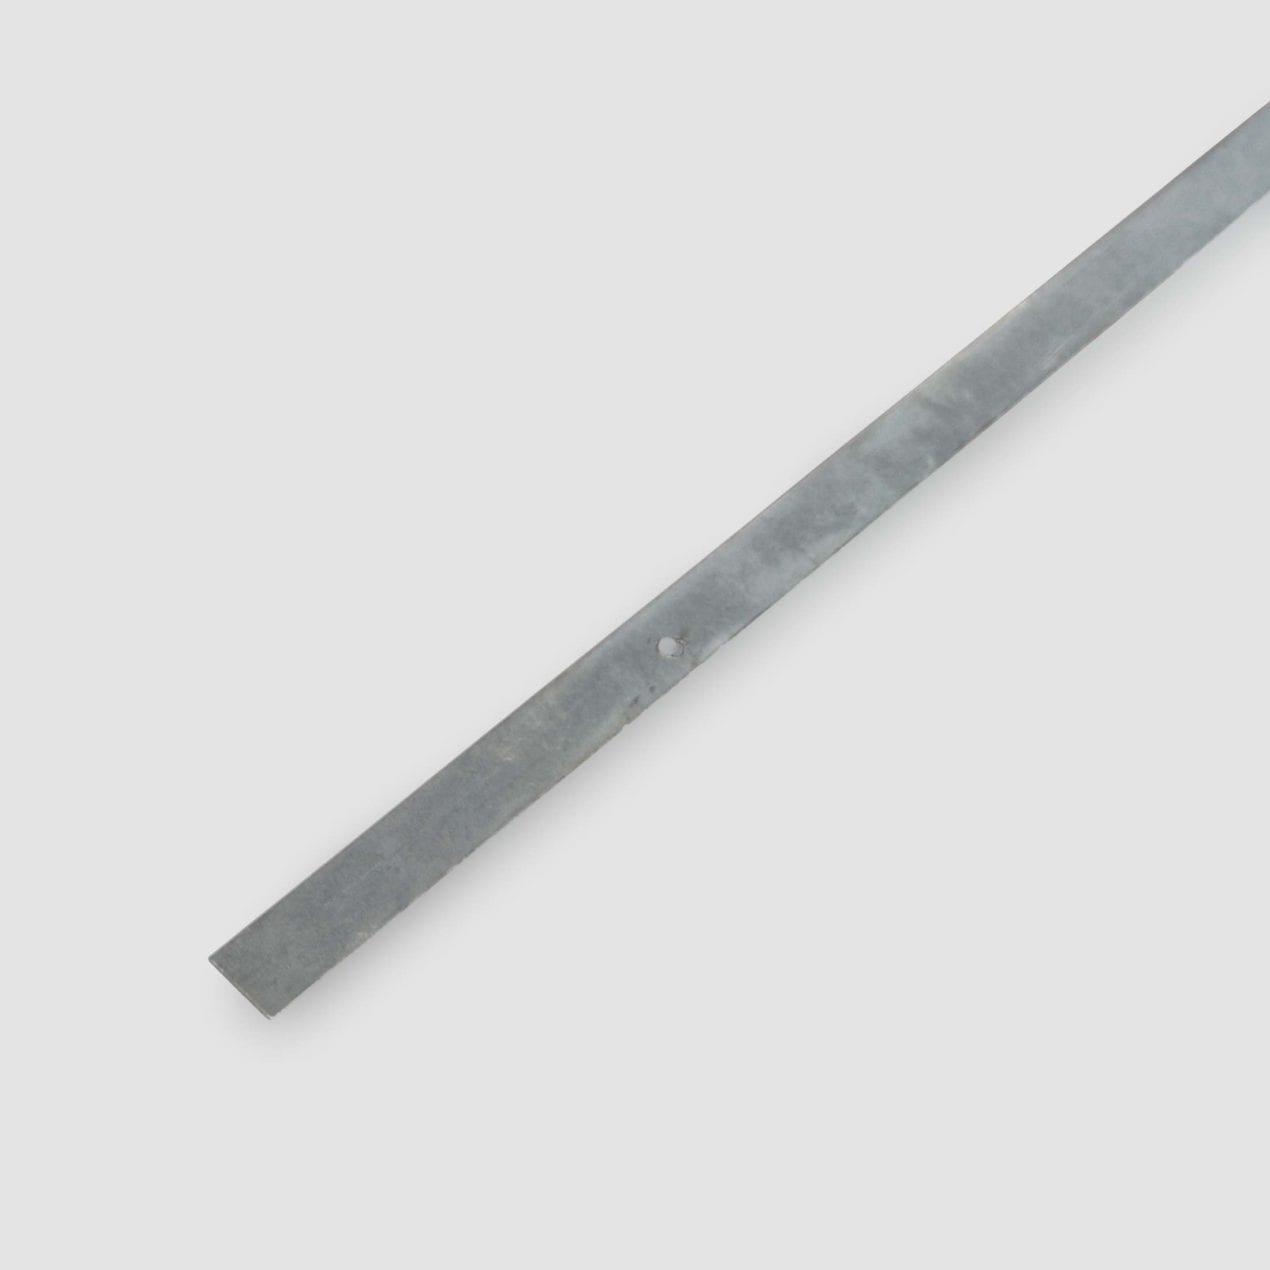 MeshGuard Steel Strip